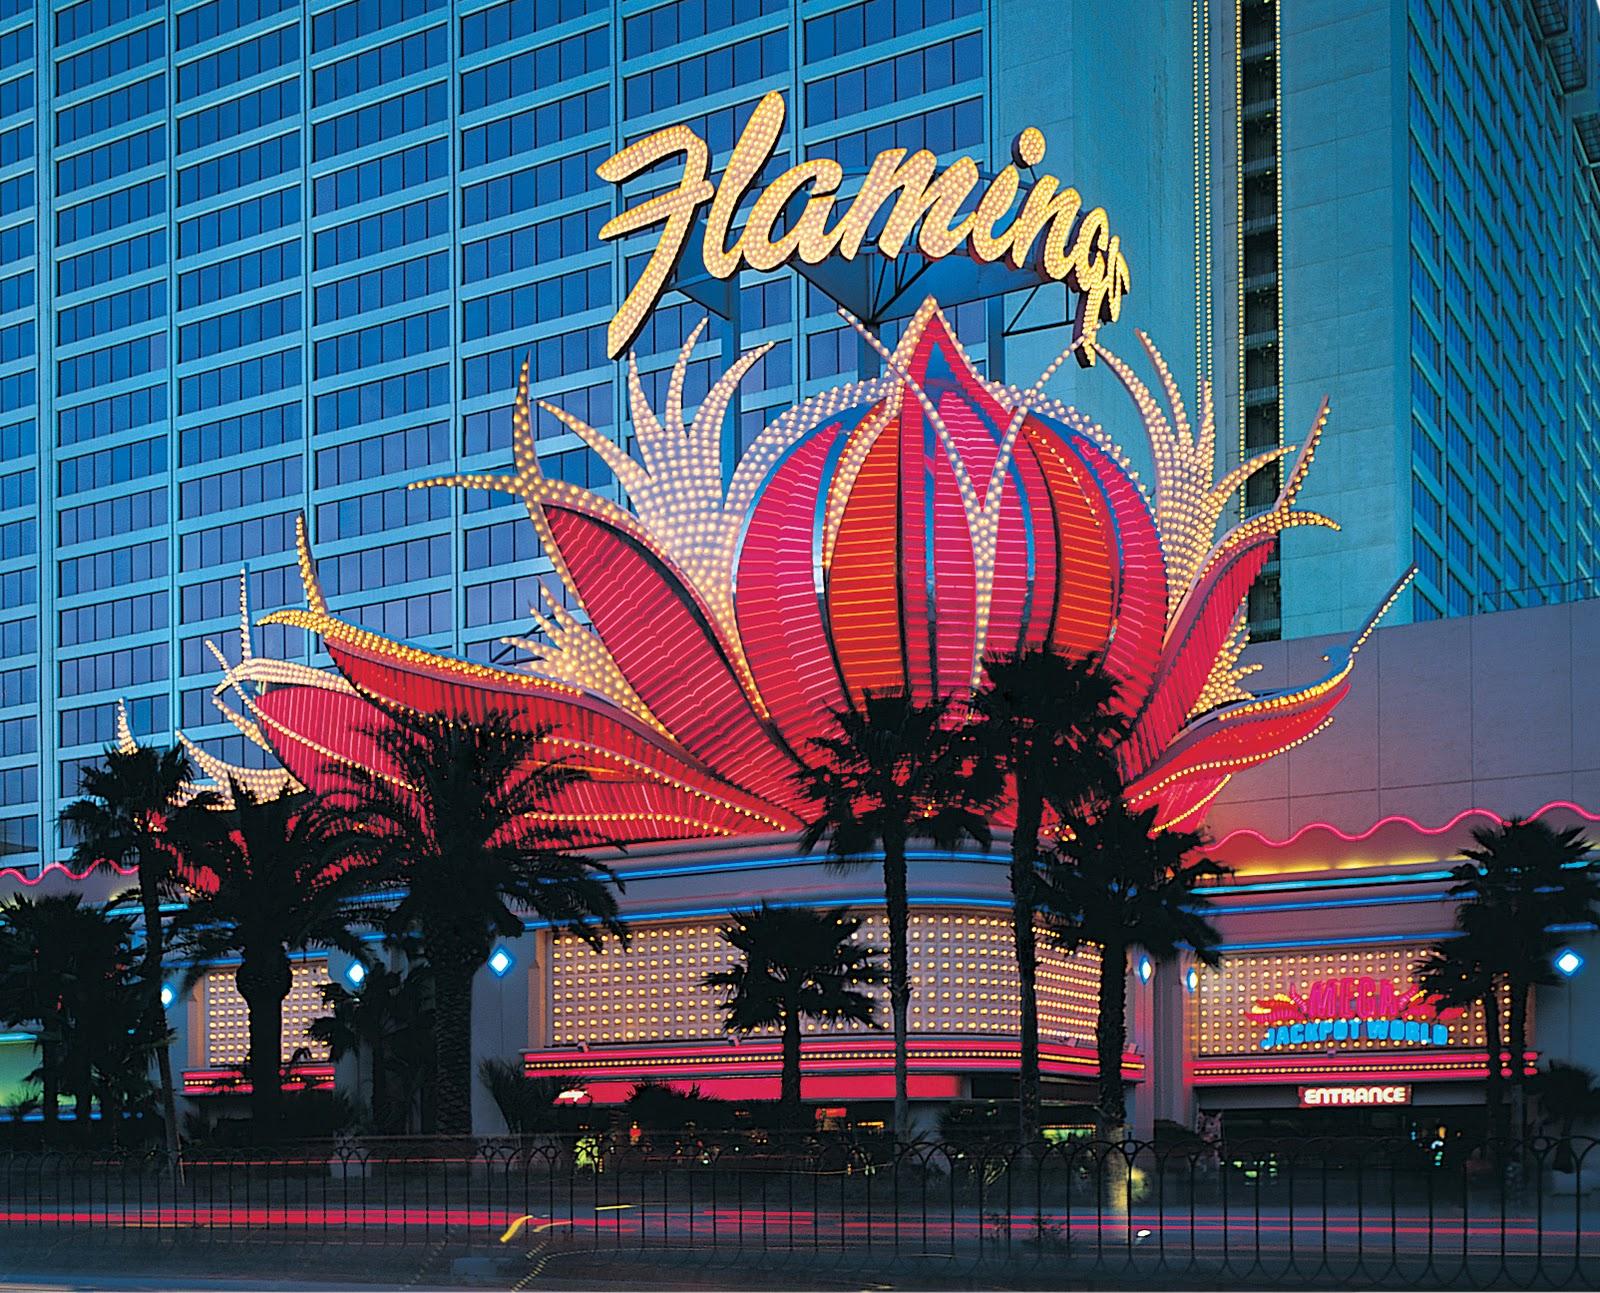 flamingo hotel and casino las